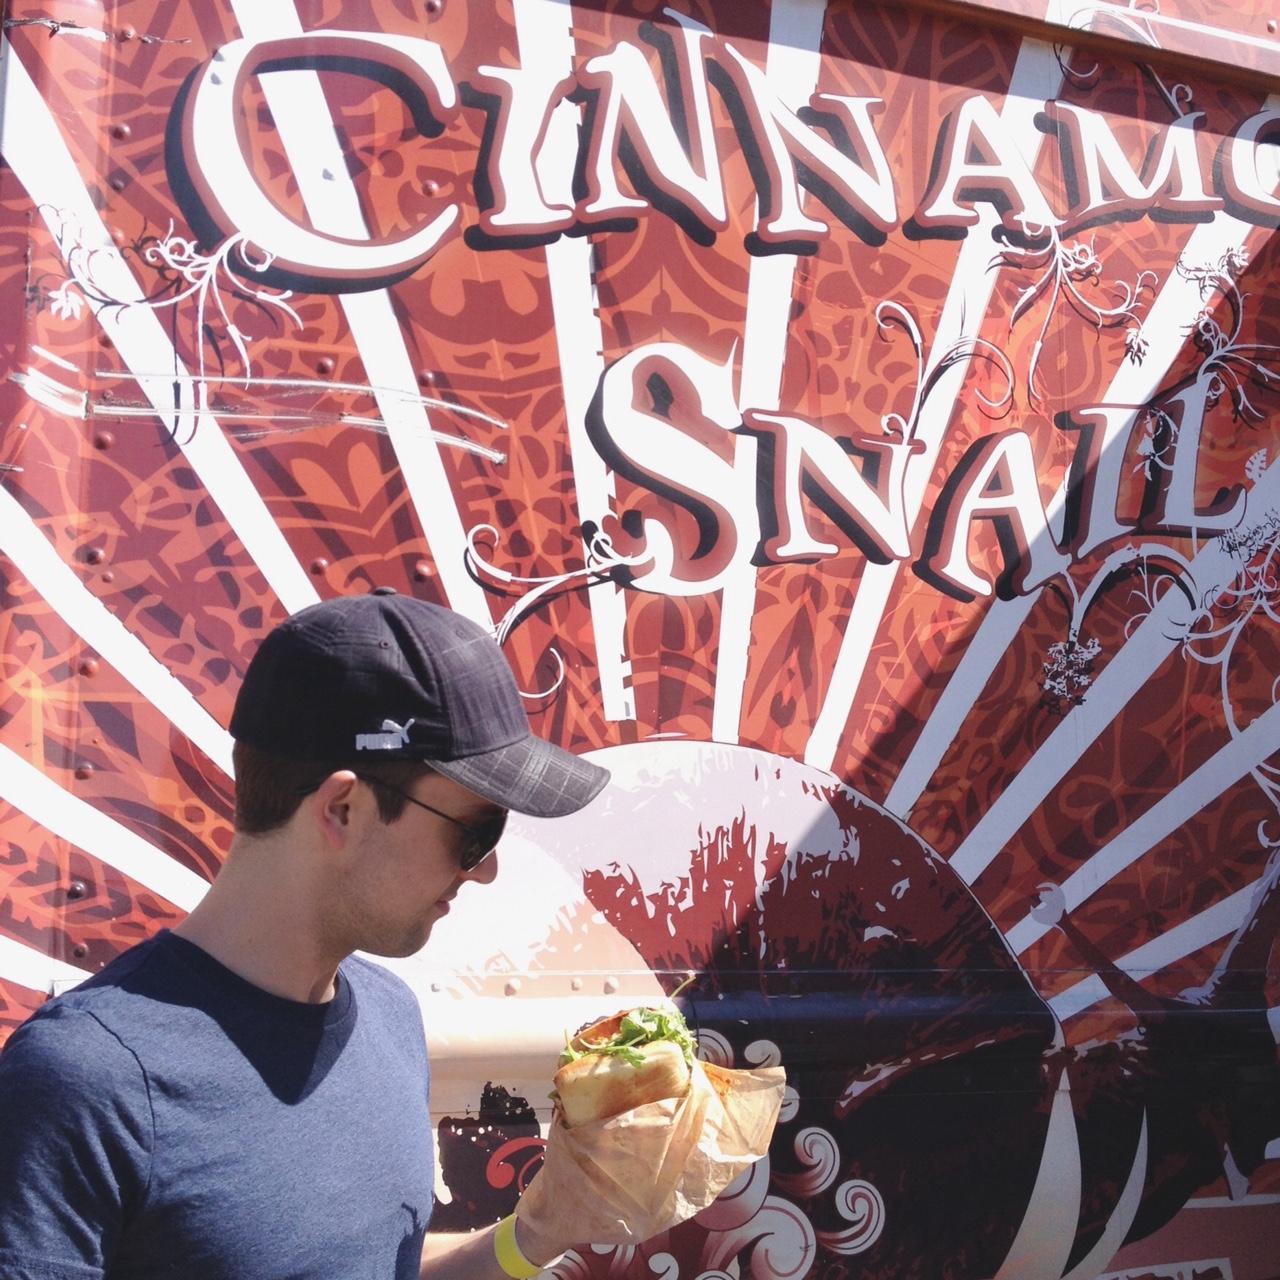 The Cinnamon Snail Vegan Food Truck